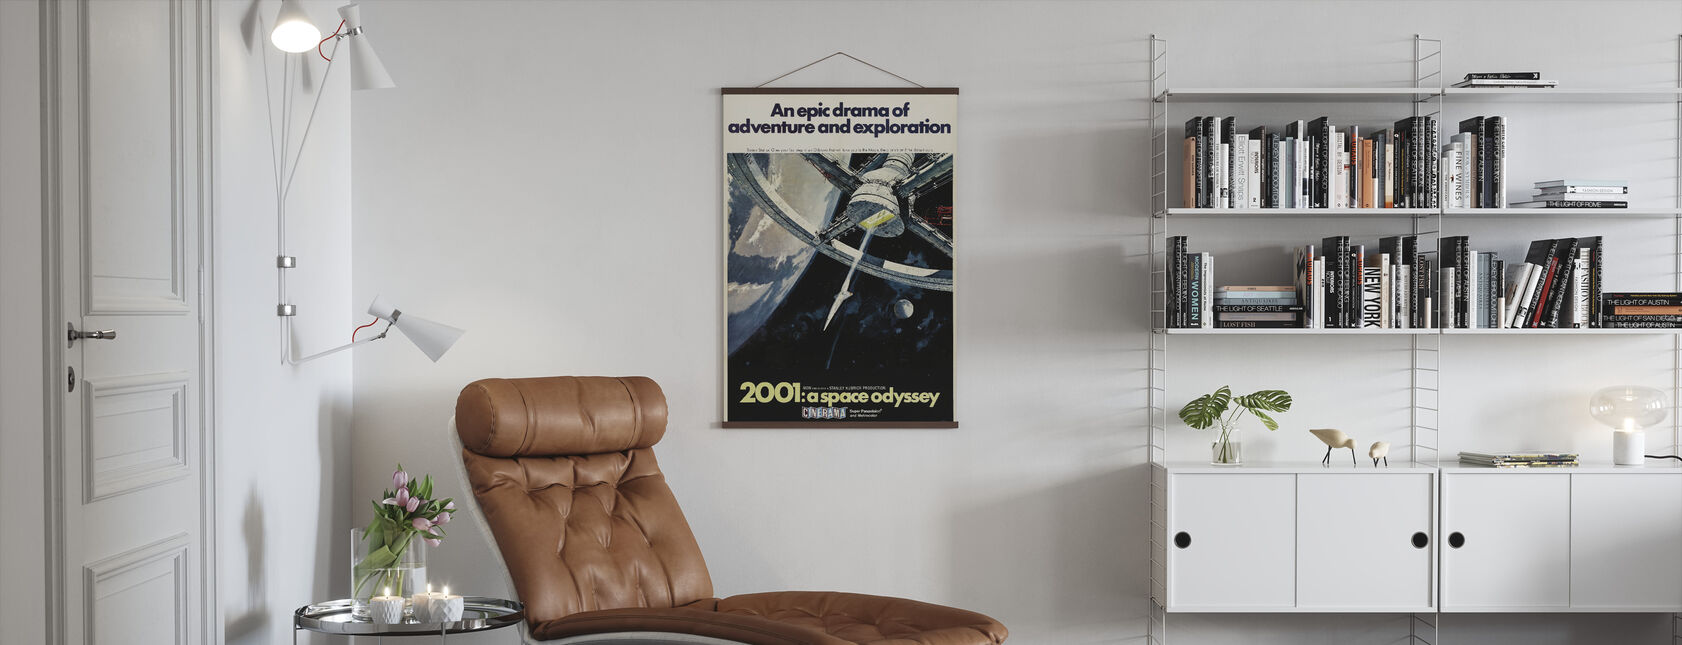 2001 En Space Odyssey - Plakat - Stue